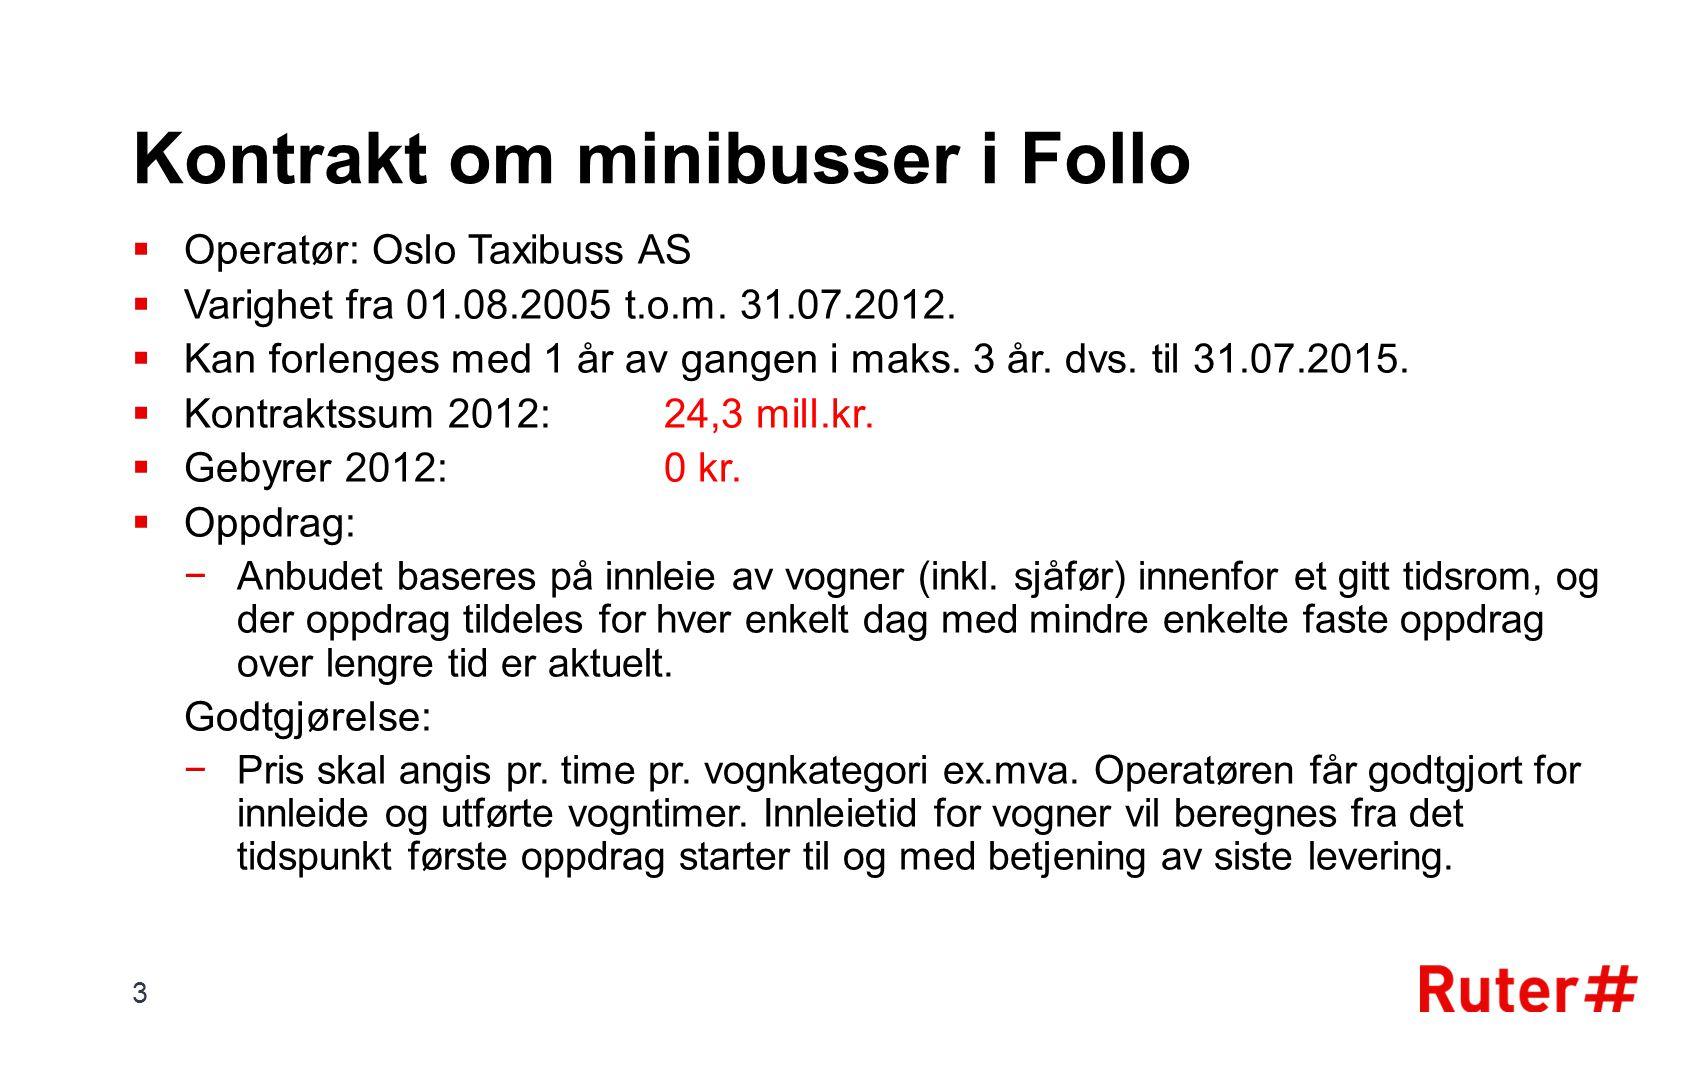 Kontrakt om minibusser i Follo